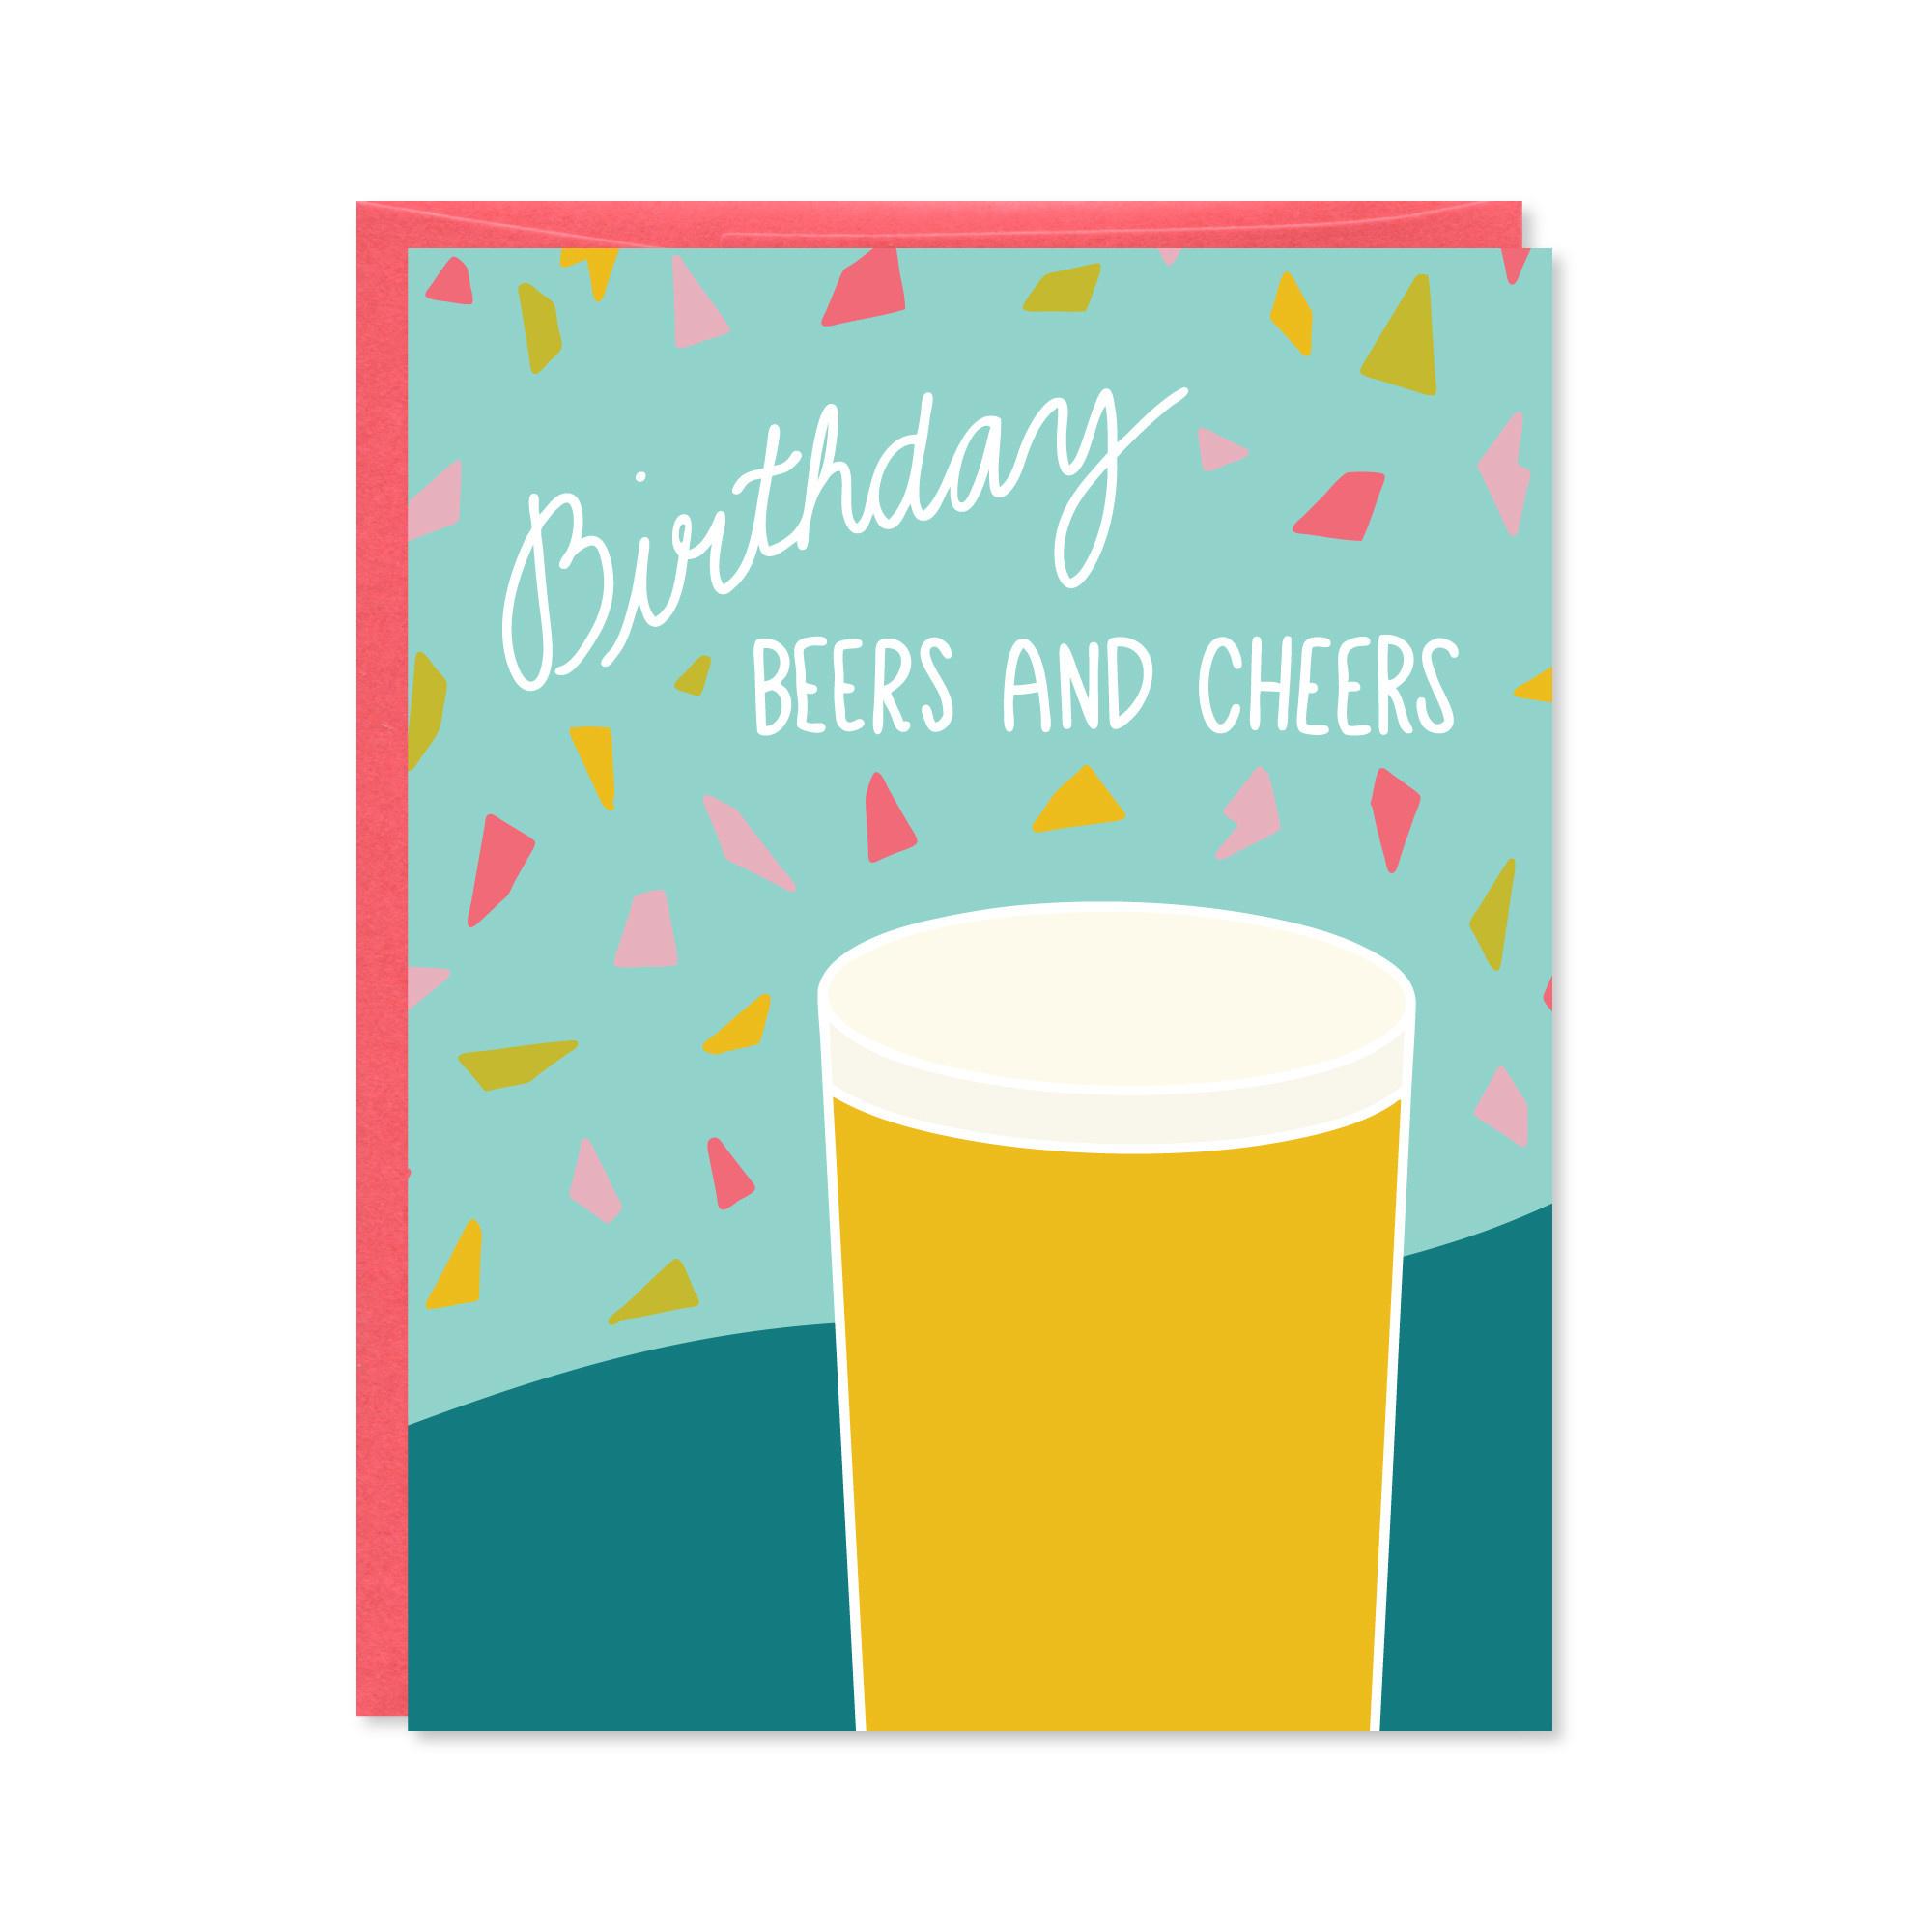 Row House 14 Beers & Cheers Birthday Card